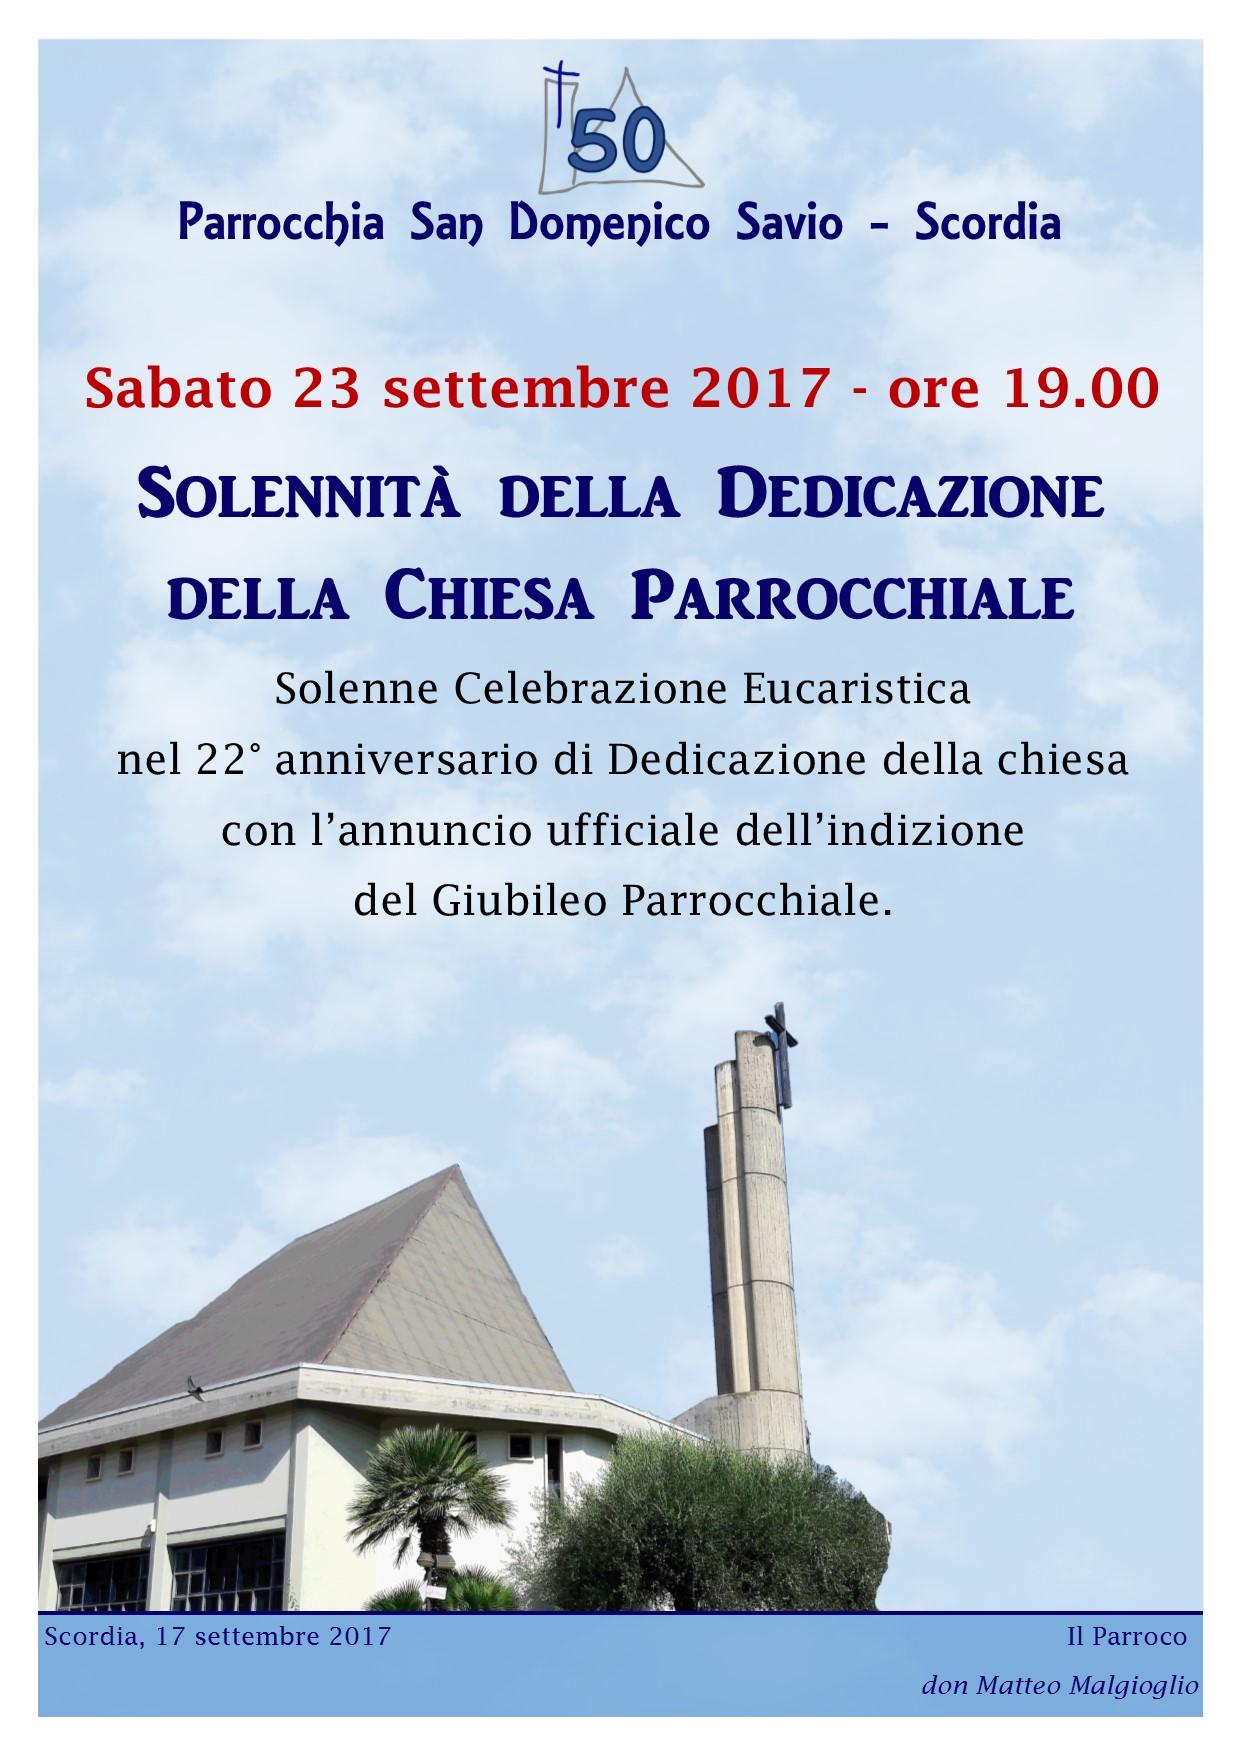 giubileo parrocchiale locandina annuncio